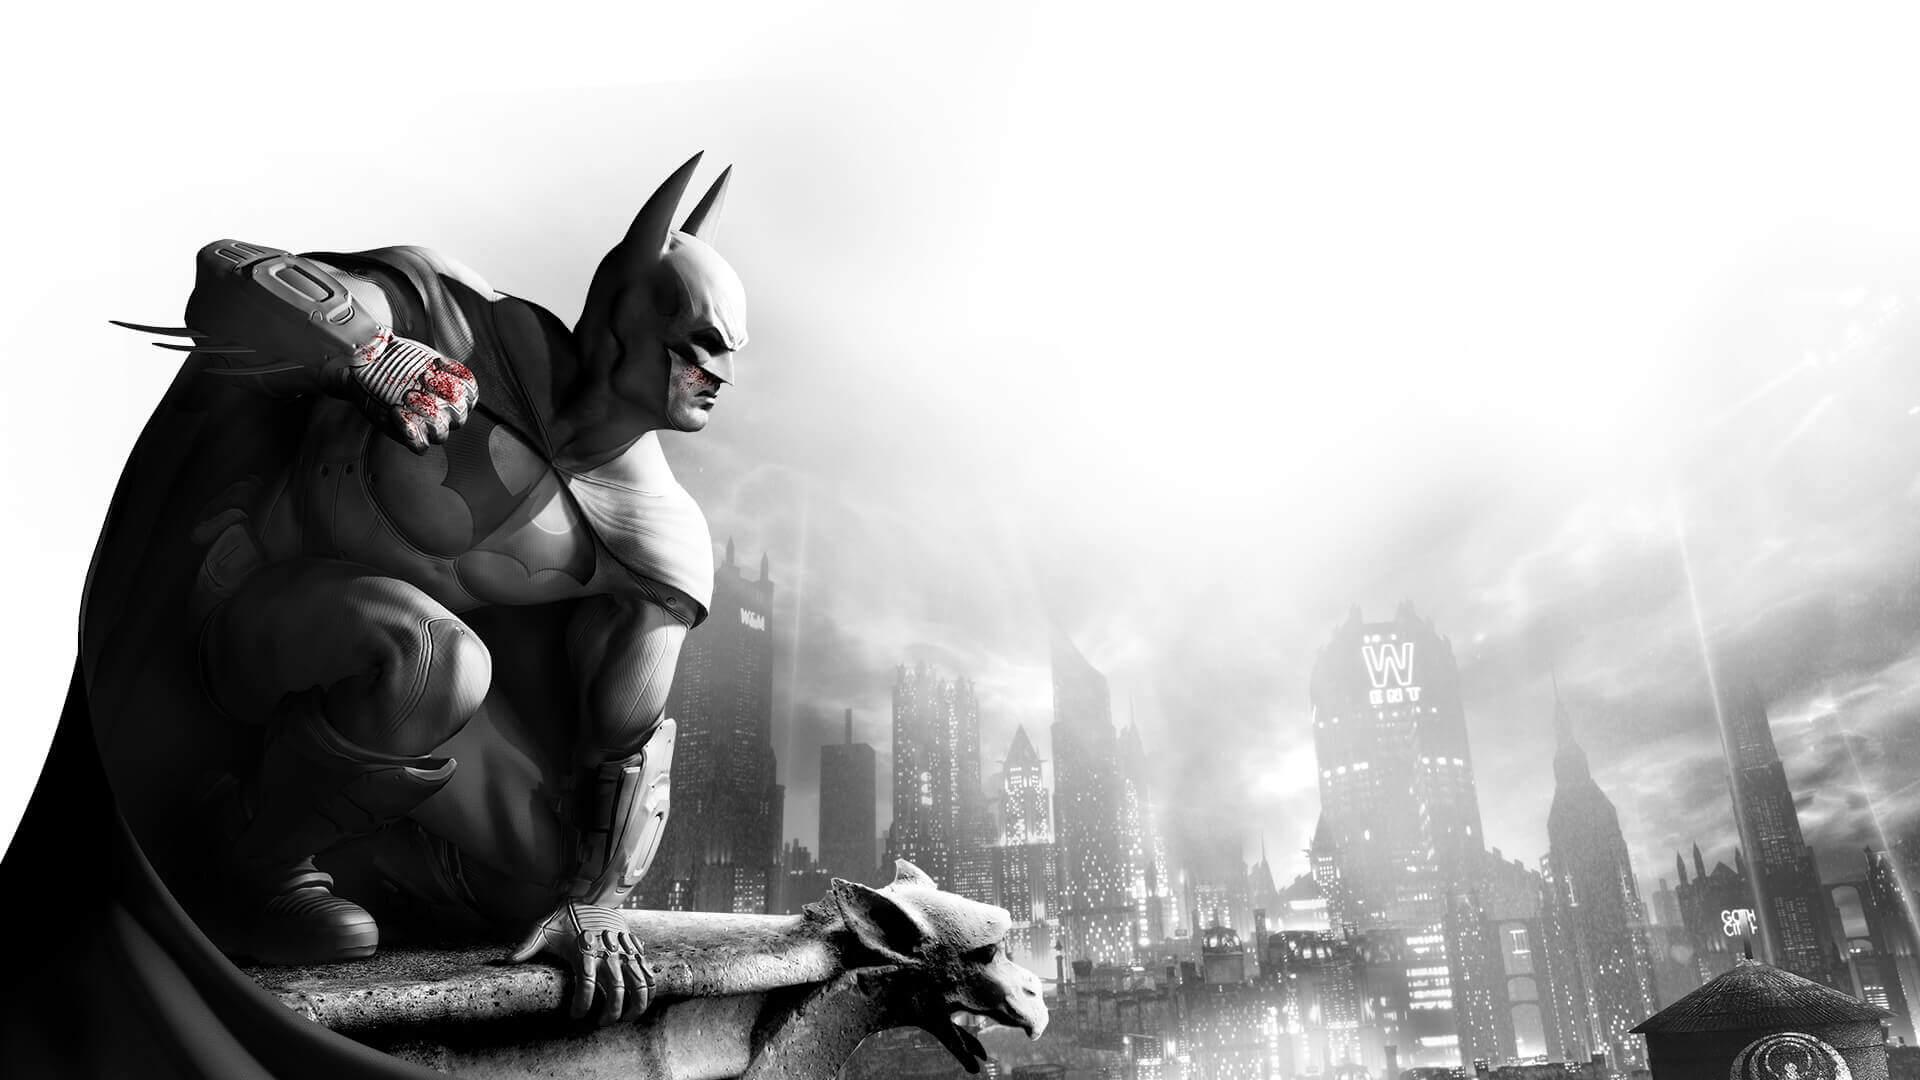 Batman: Arkham Serisi Ücretsiz Oldu!! Hemen Al